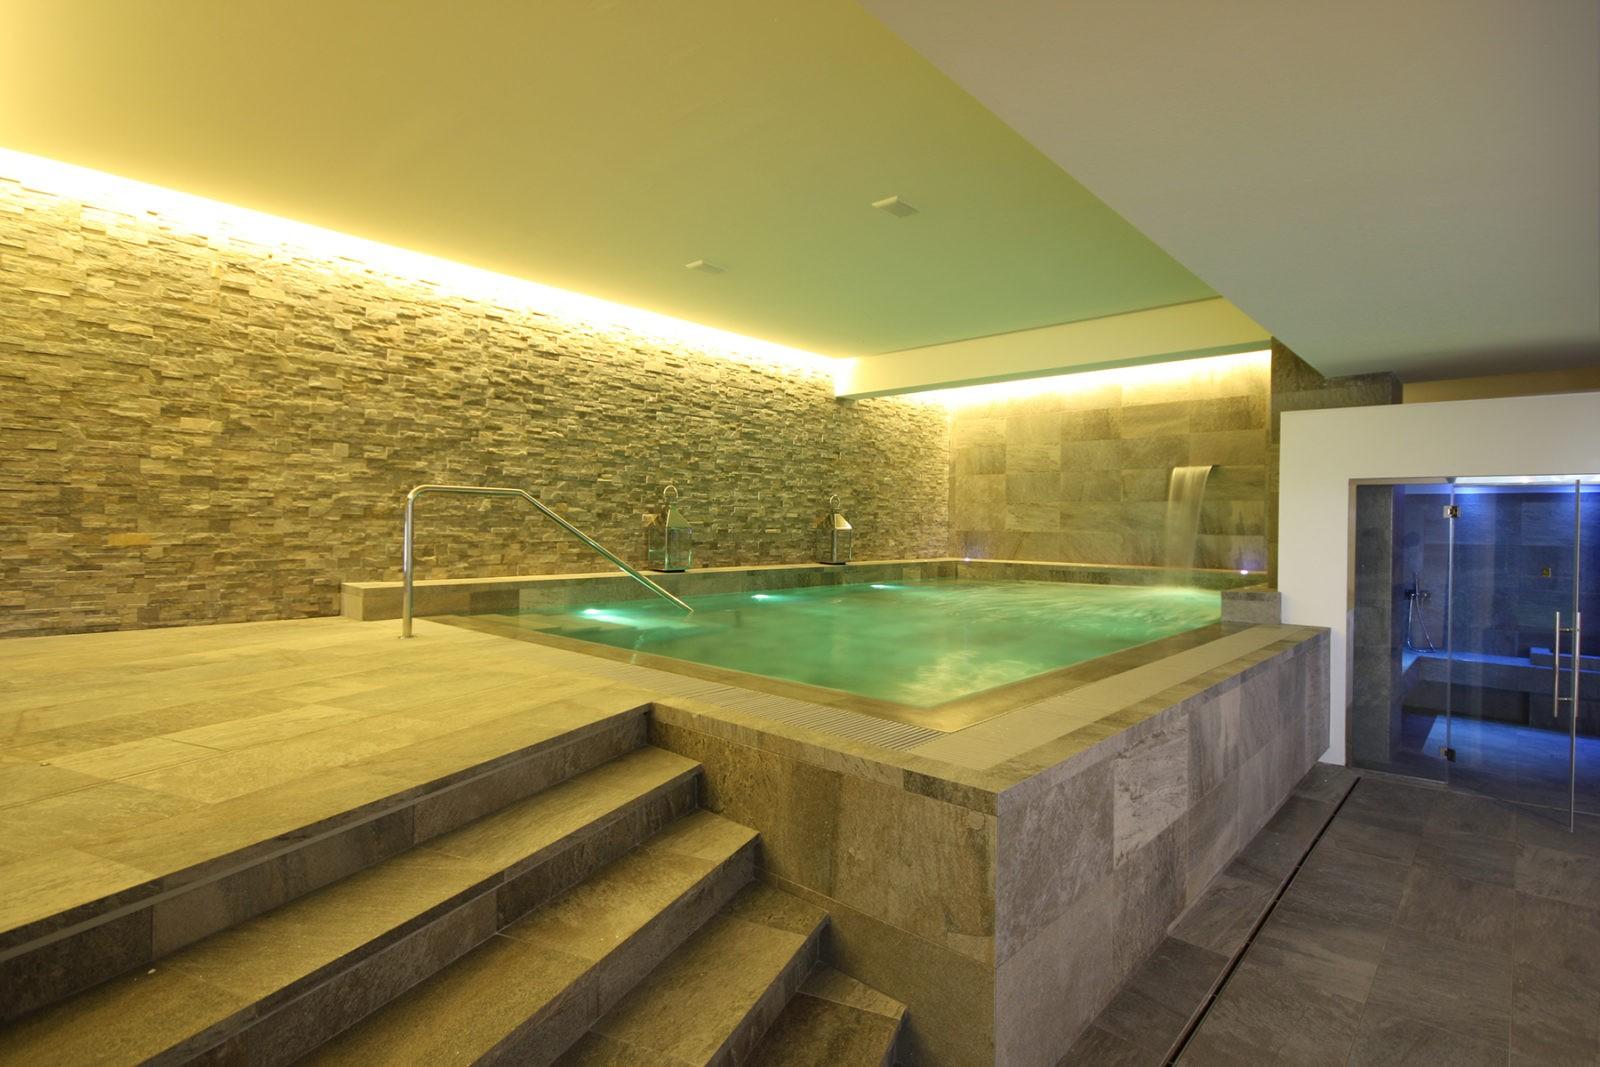 Hotel Mamiani vasca idromassaggio bagno turco